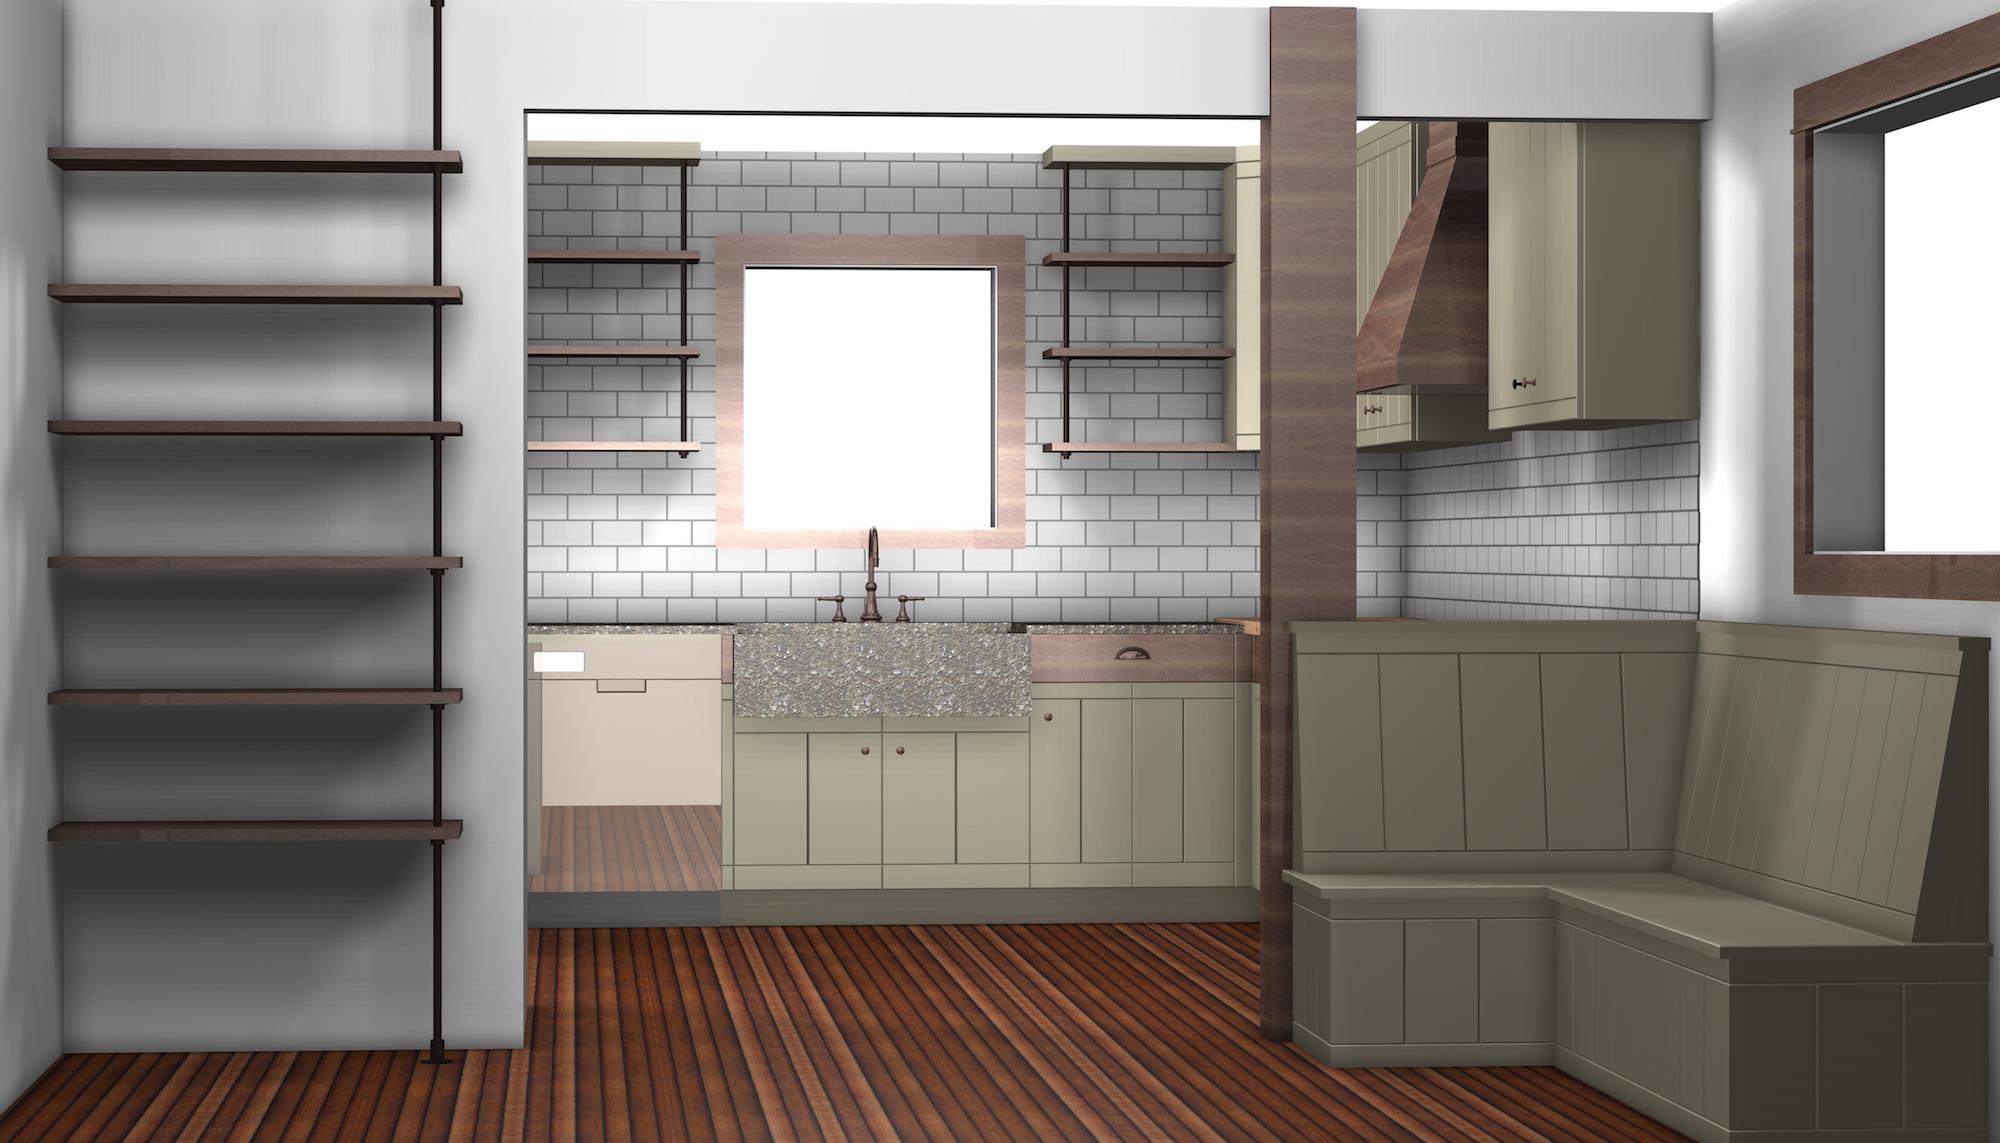 ShoreHaven+Kitchens+Rendering-1a